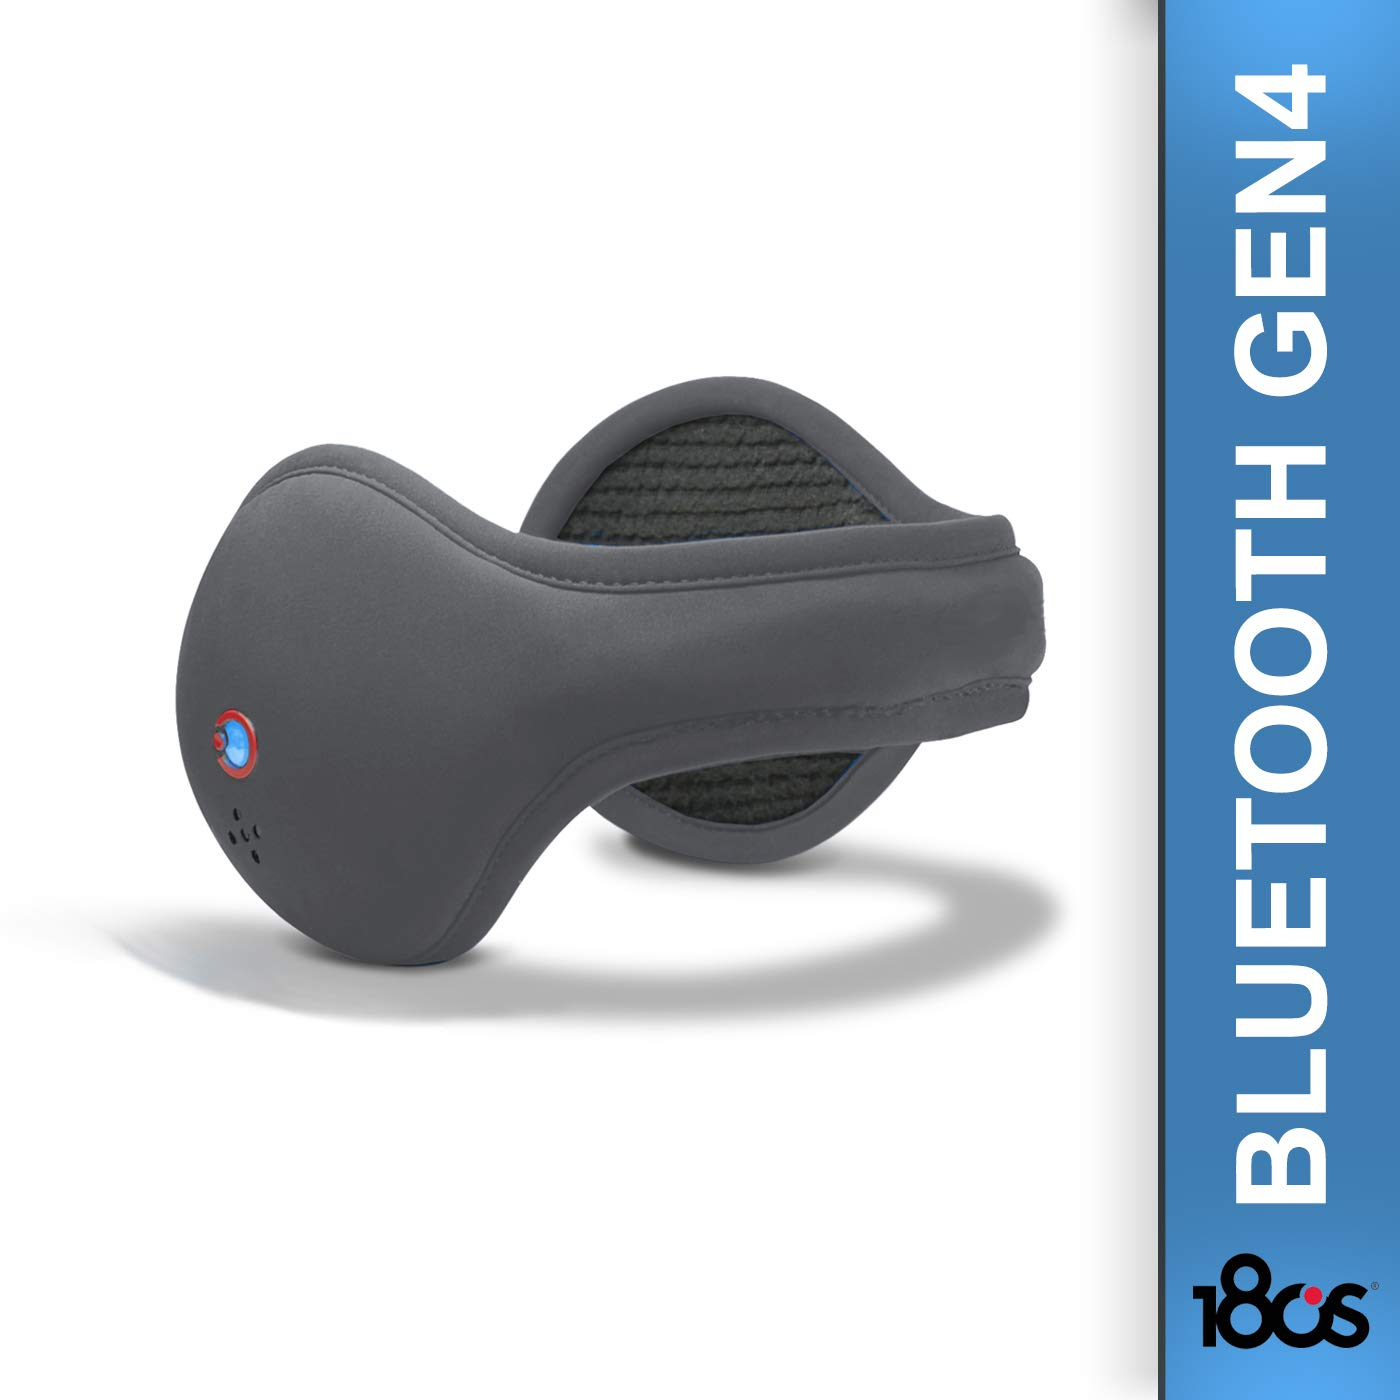 180s Mens Bluetooth HD IV Ear Warmer – Gen4 – Built-in Mic Hi-Definition Speakers – Siri Google Now Activation – Adjustable Size Black Webyshops 21714-001-01